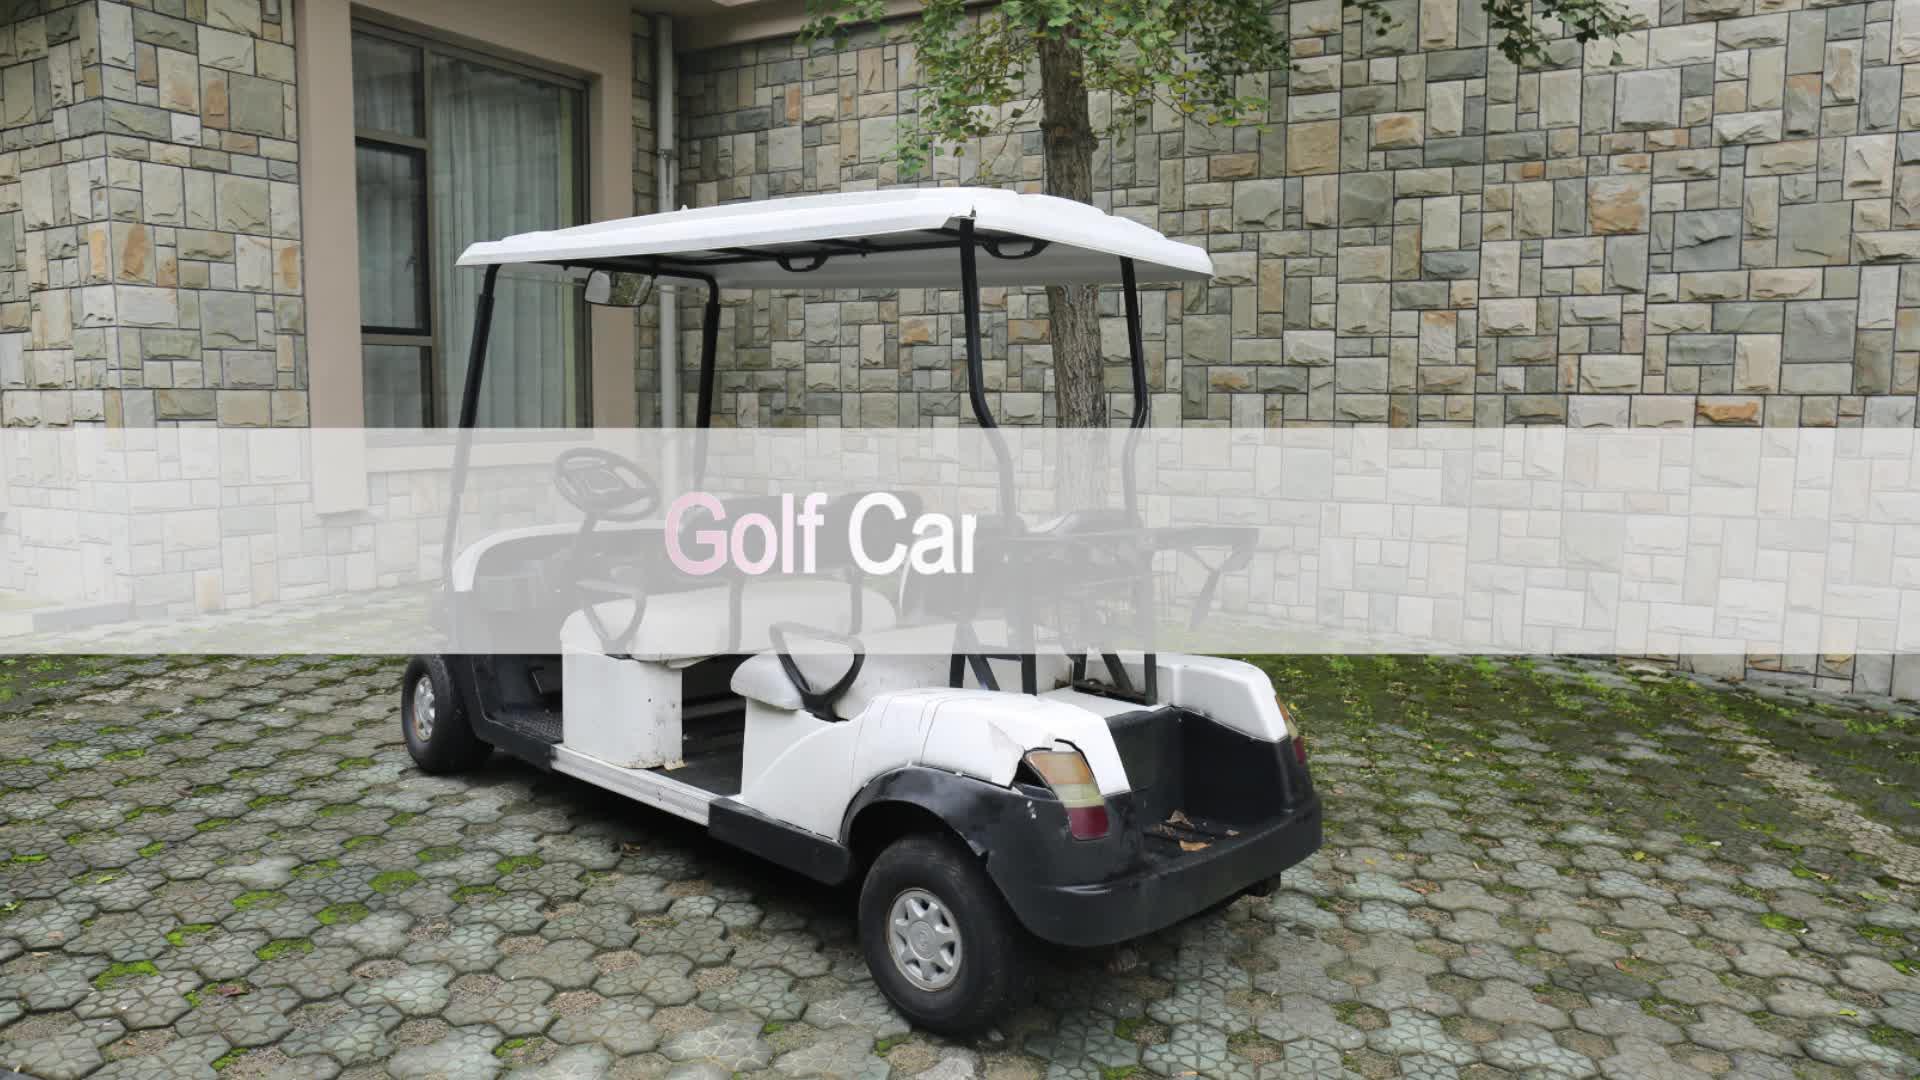 Super-heldere PVC venster Gemodificeerde 2-4 Passenger Golf Auto Behuizing Cover EZ go Golfkar Regenhoes